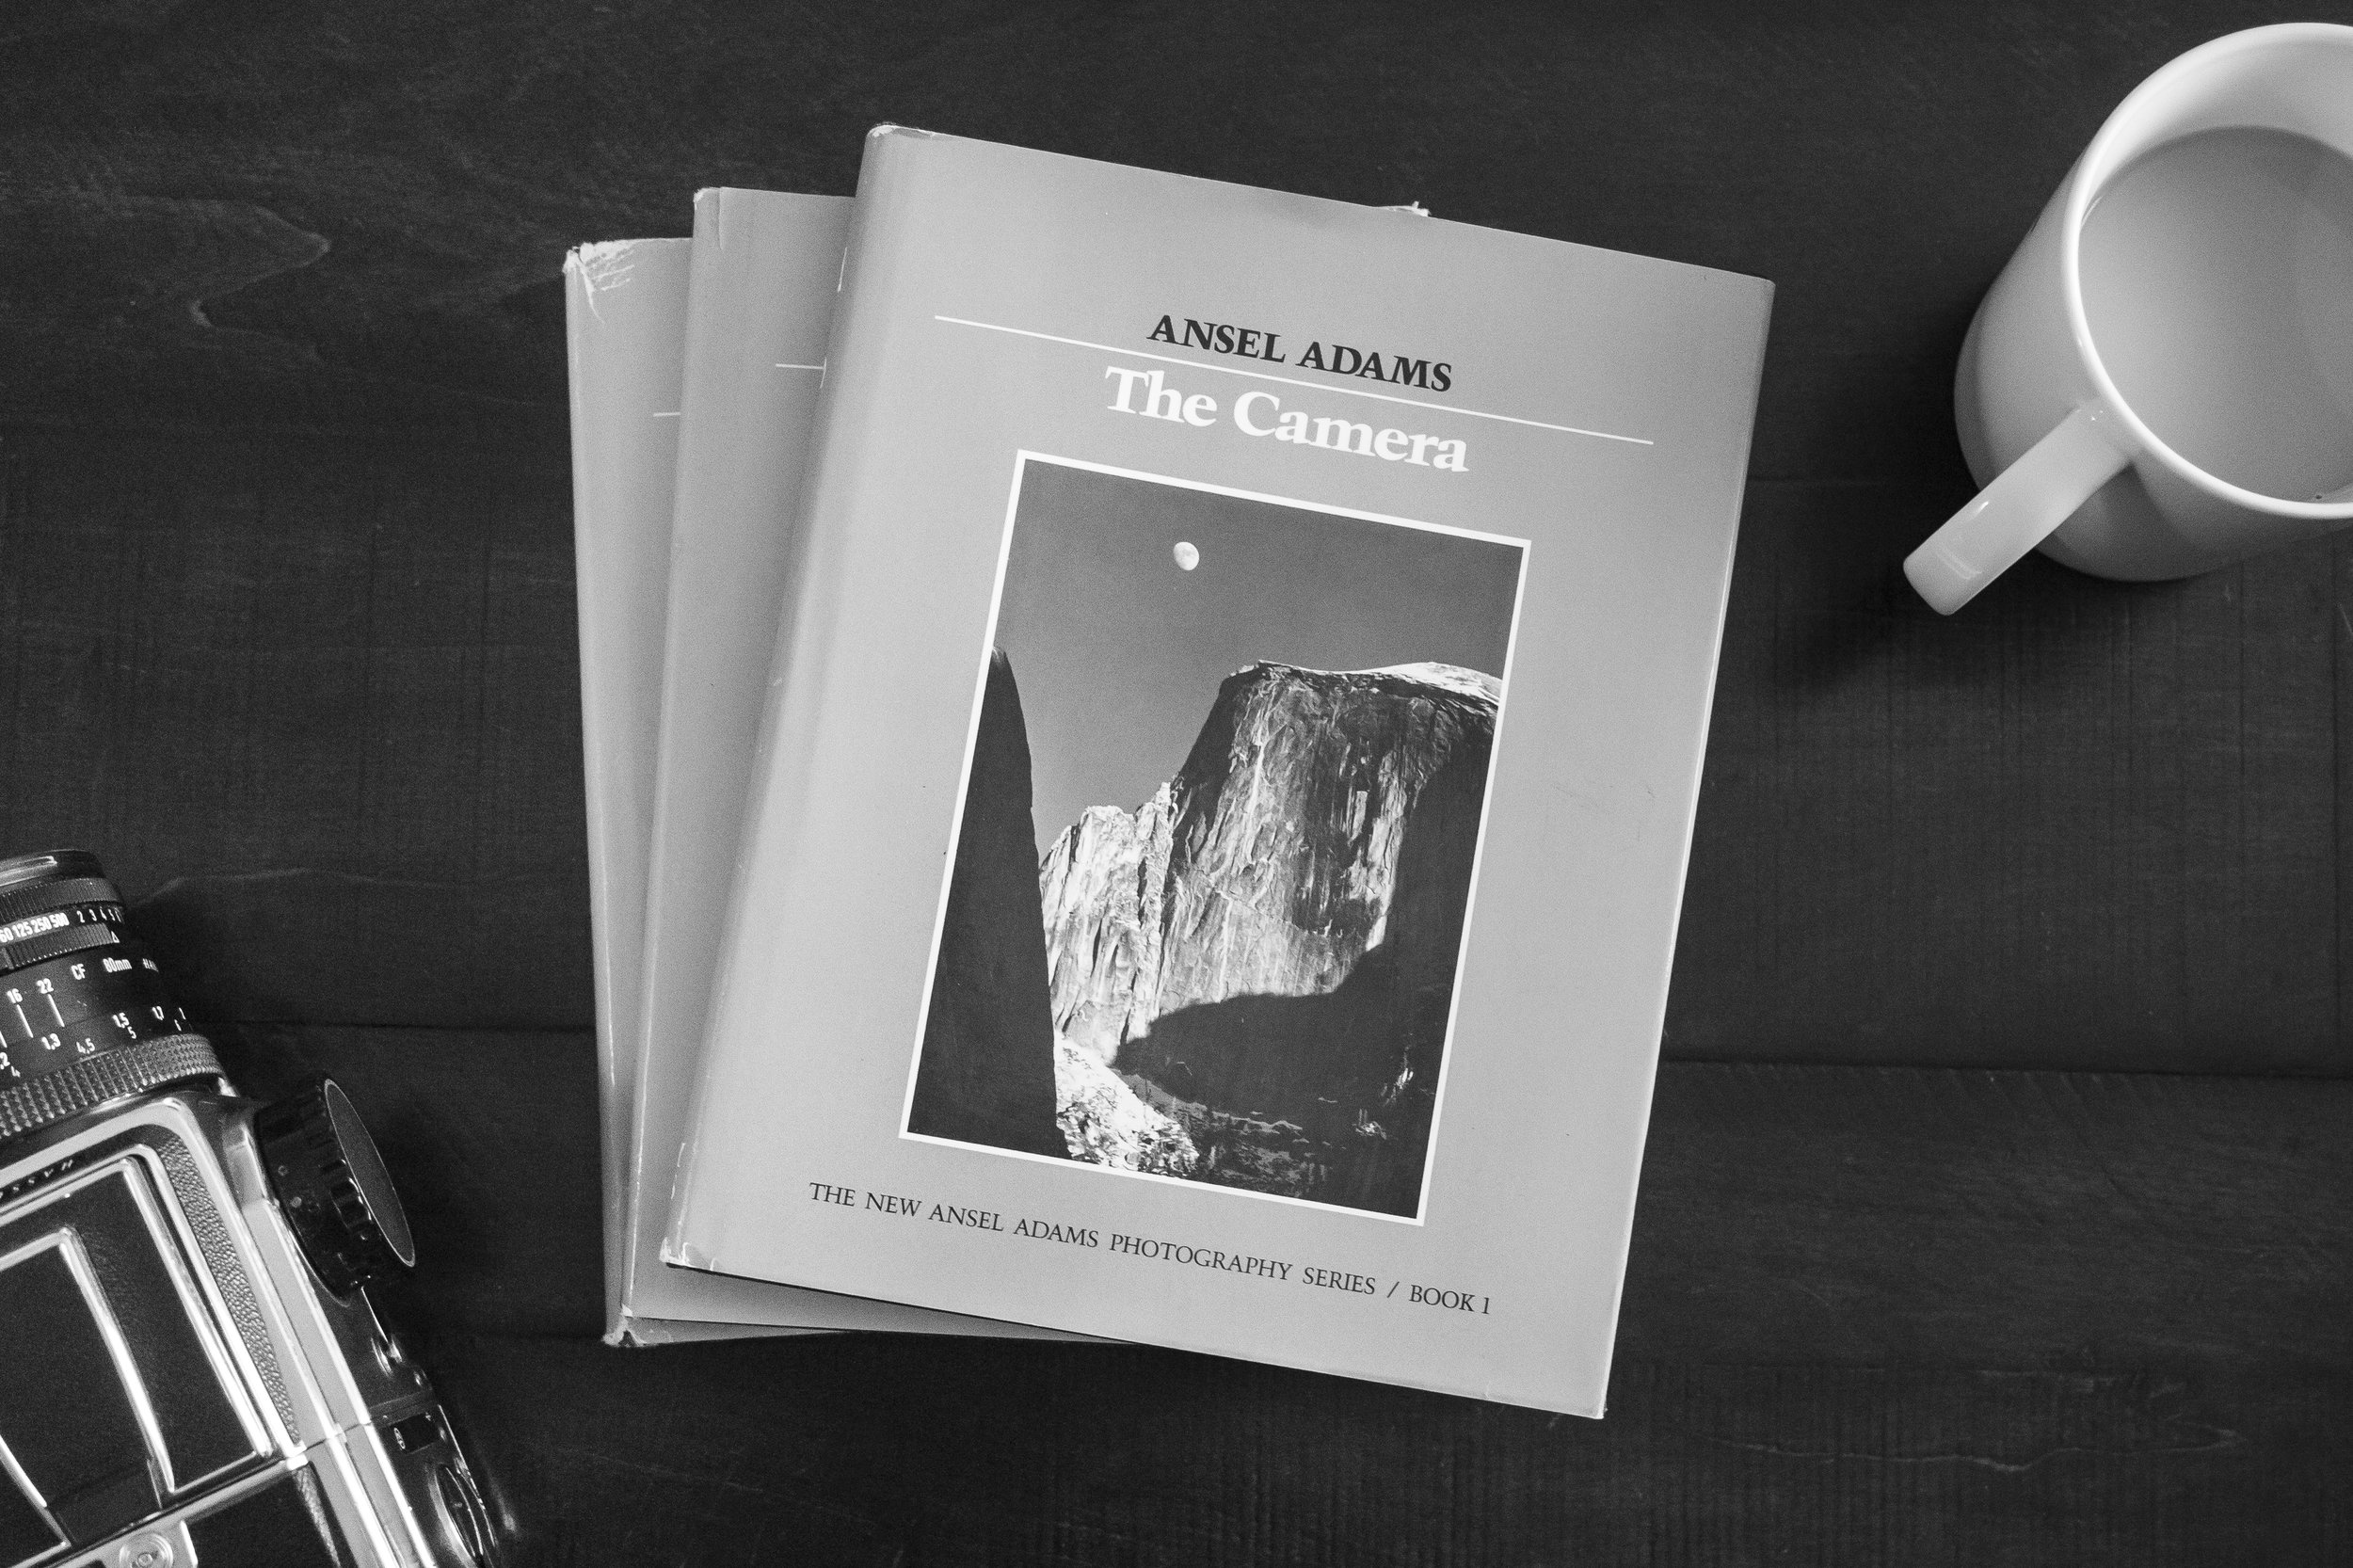 Photography Books Ansel Adams The Camera Negative Print